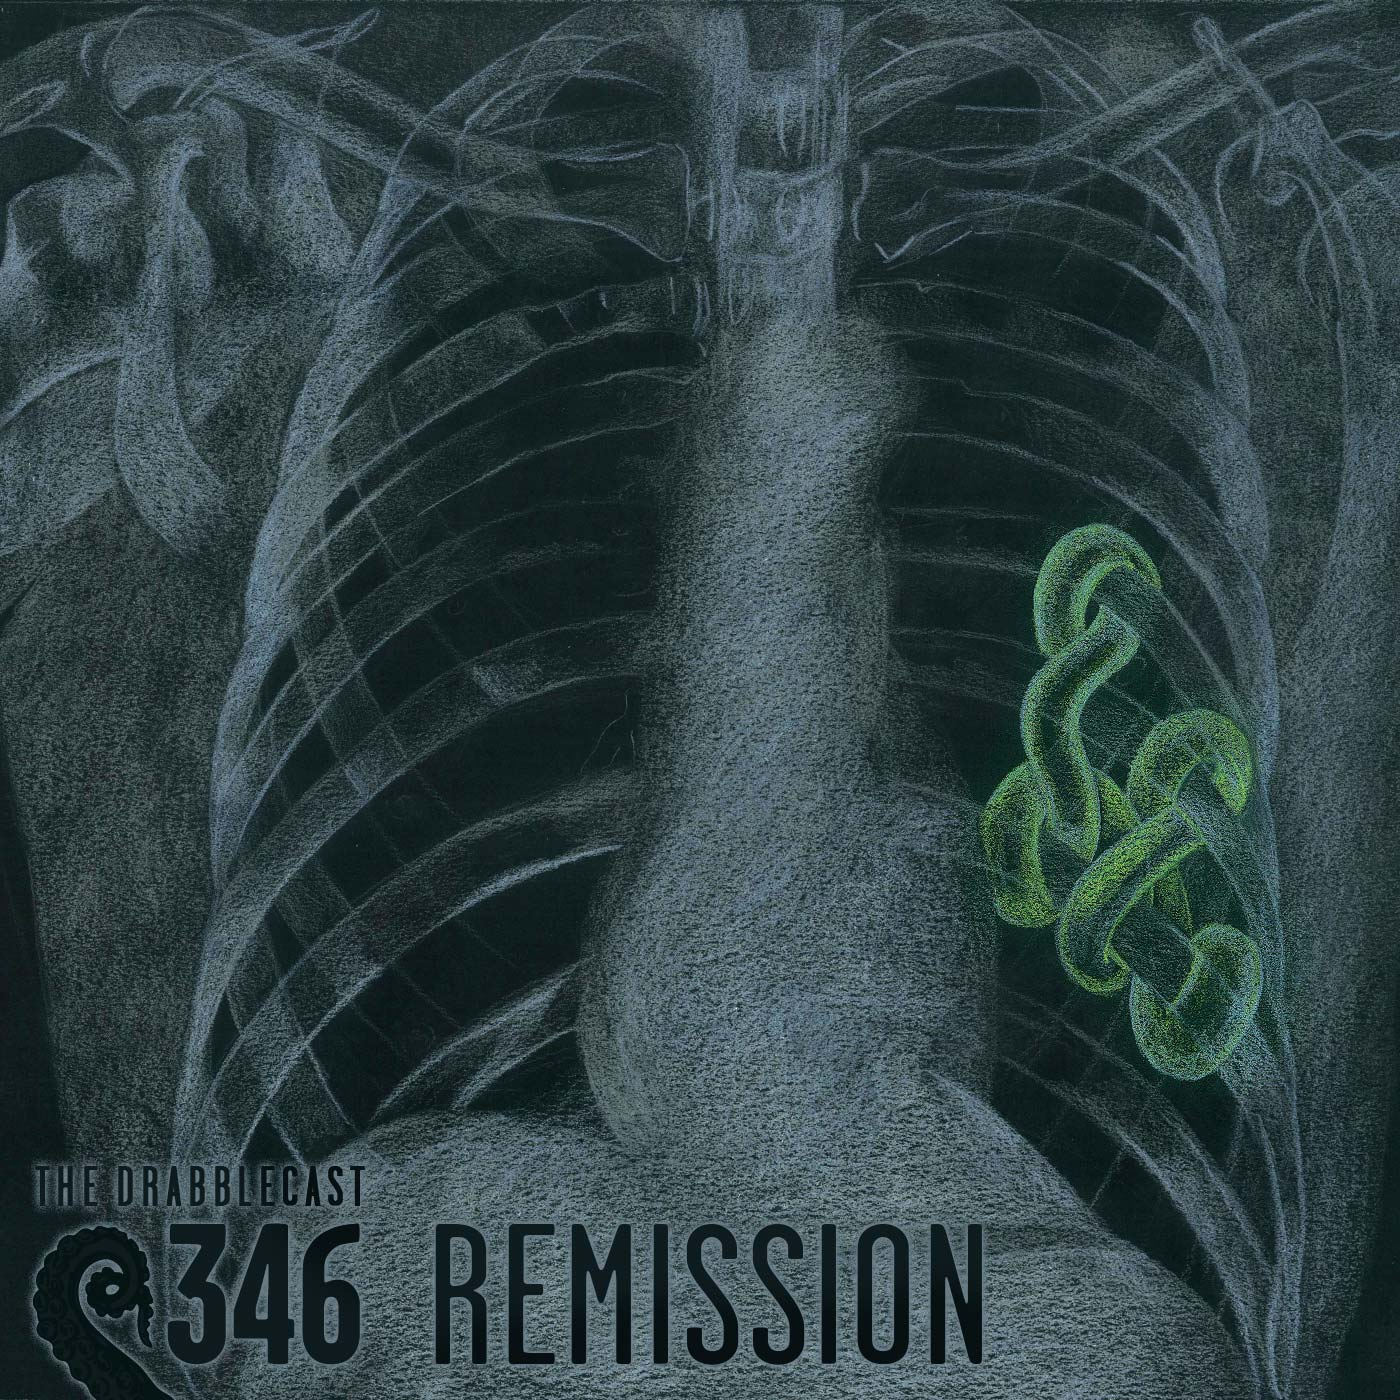 Drabblecast episode 346, Remission, by Jessica Craddock